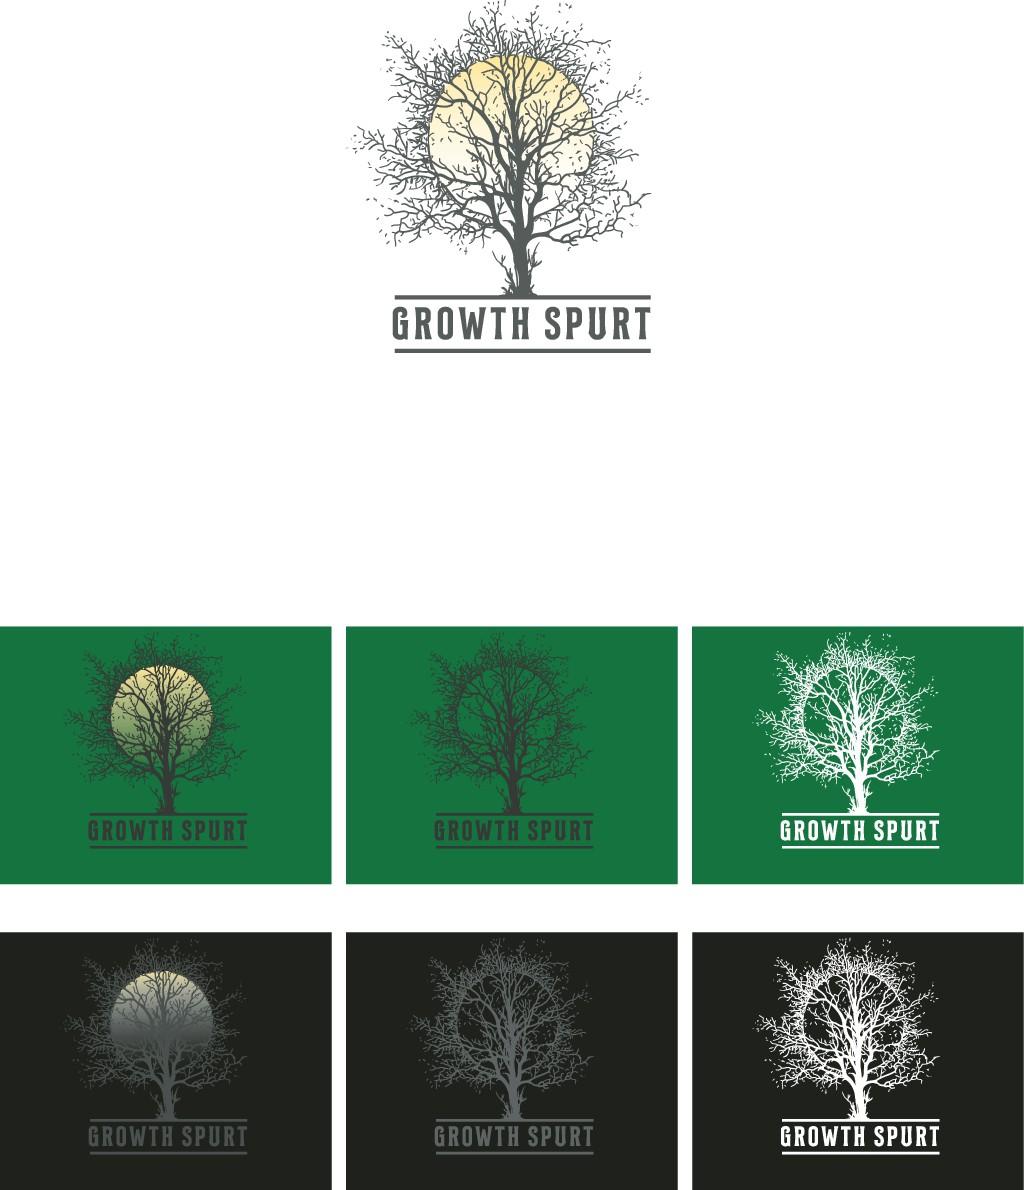 Design an inspiring logo that appeals to hard working men.